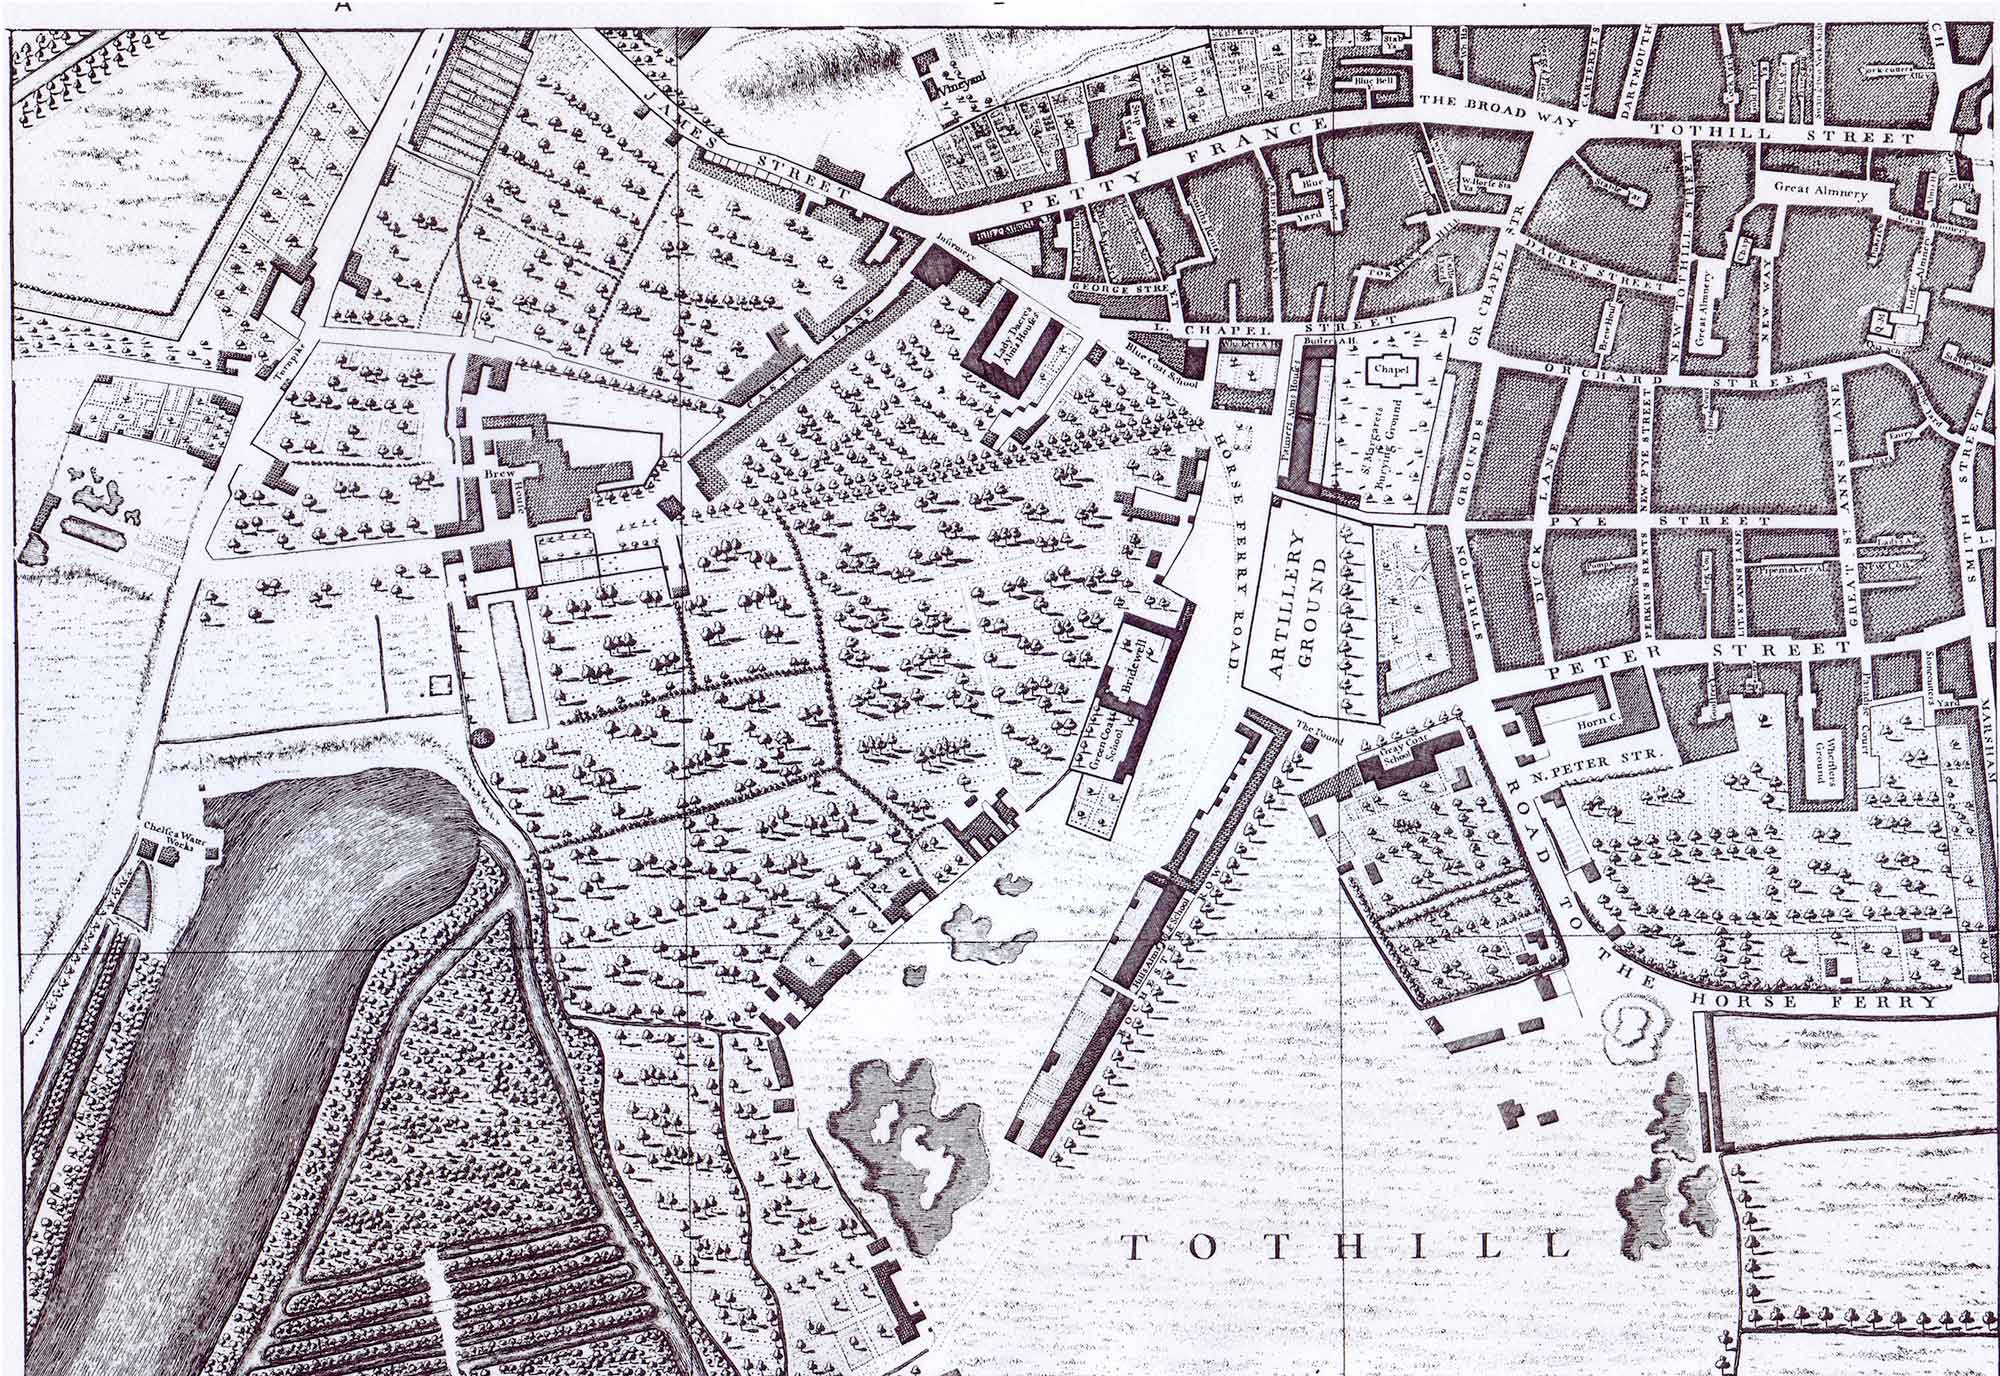 strutton-ground-openstudio-architects-historical-map